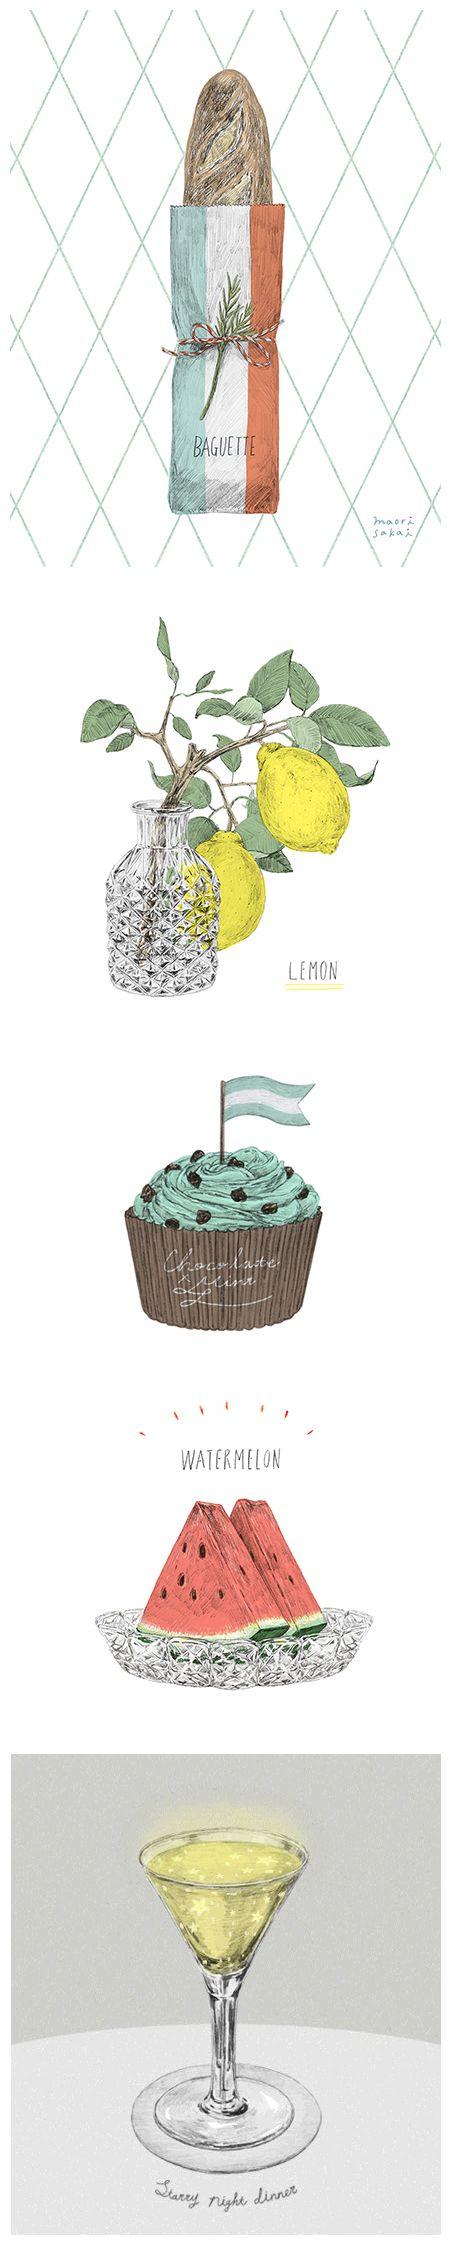 Food illustrations by Maori Sakai